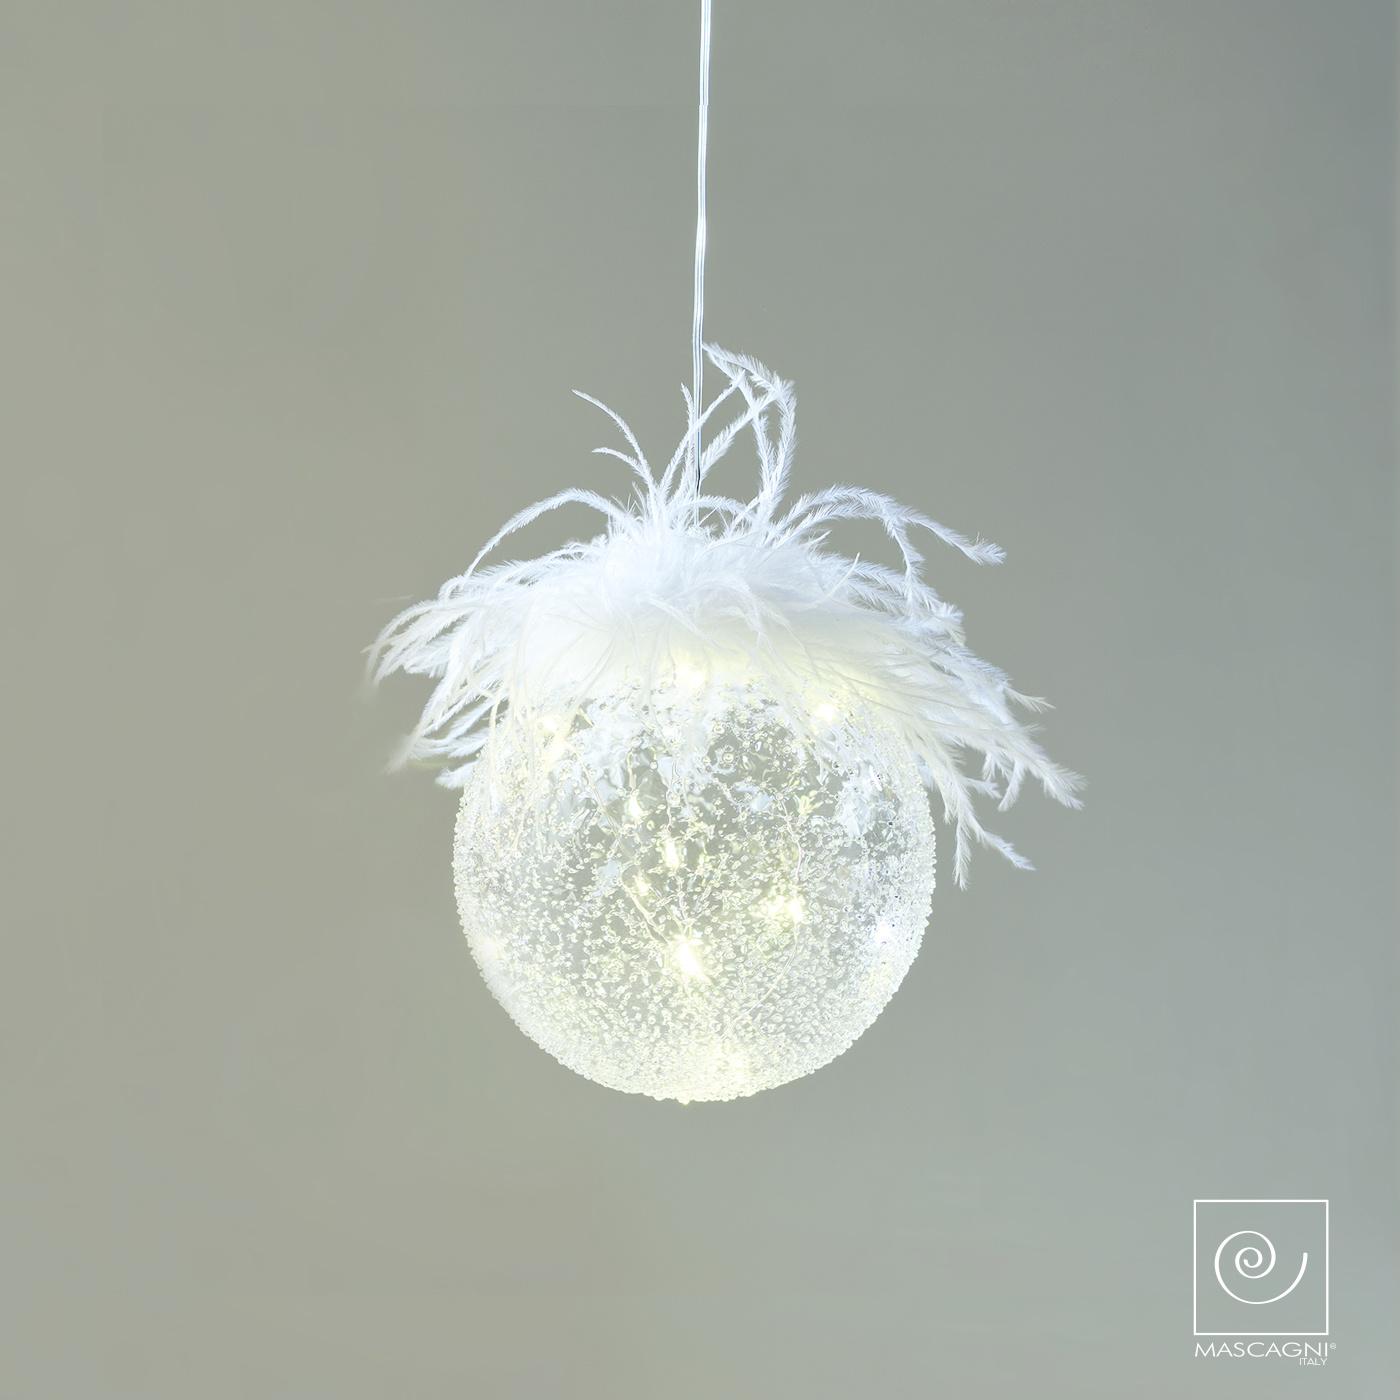 Art Mascagni LED BALL DIAM.12